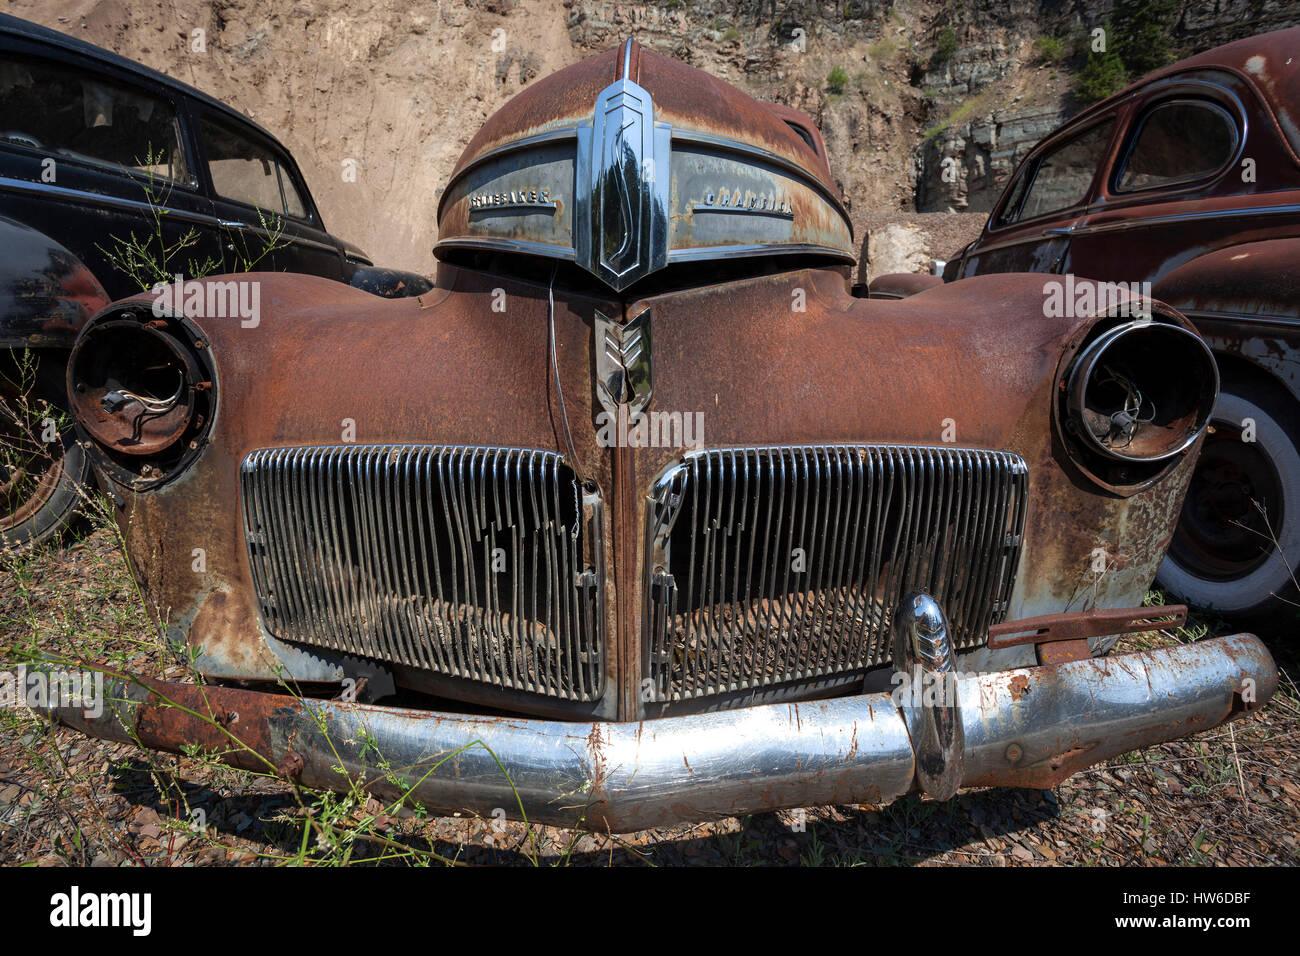 Oldtimer, Studebaker Champion, scrap car, near Spokane, Washington, USA - Stock Image